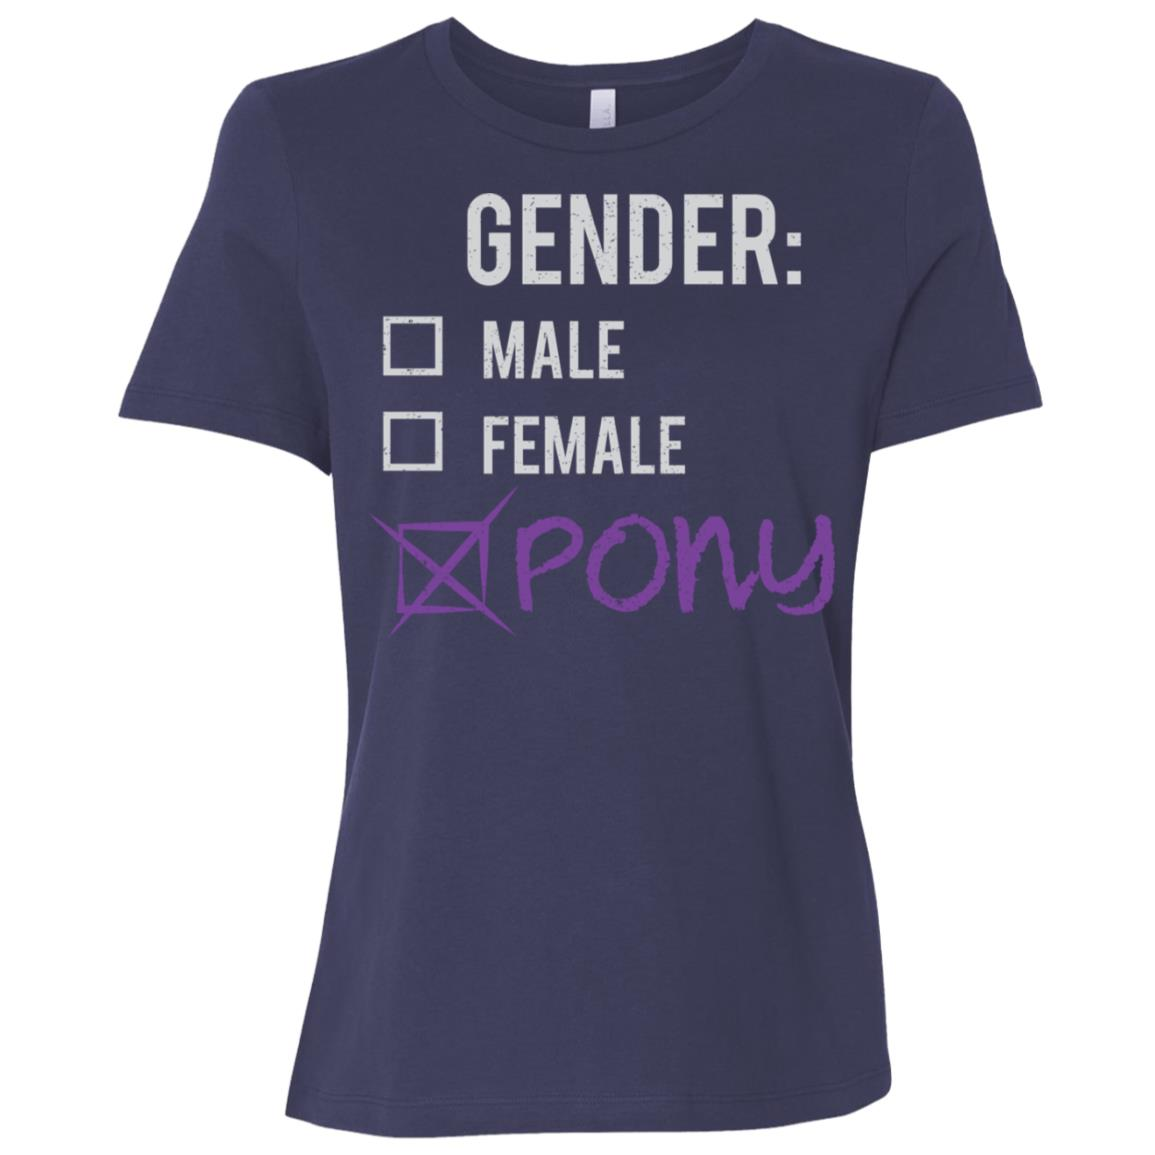 Male Female Pony Gender Nonbinary Trans Women Short Sleeve T-Shirt